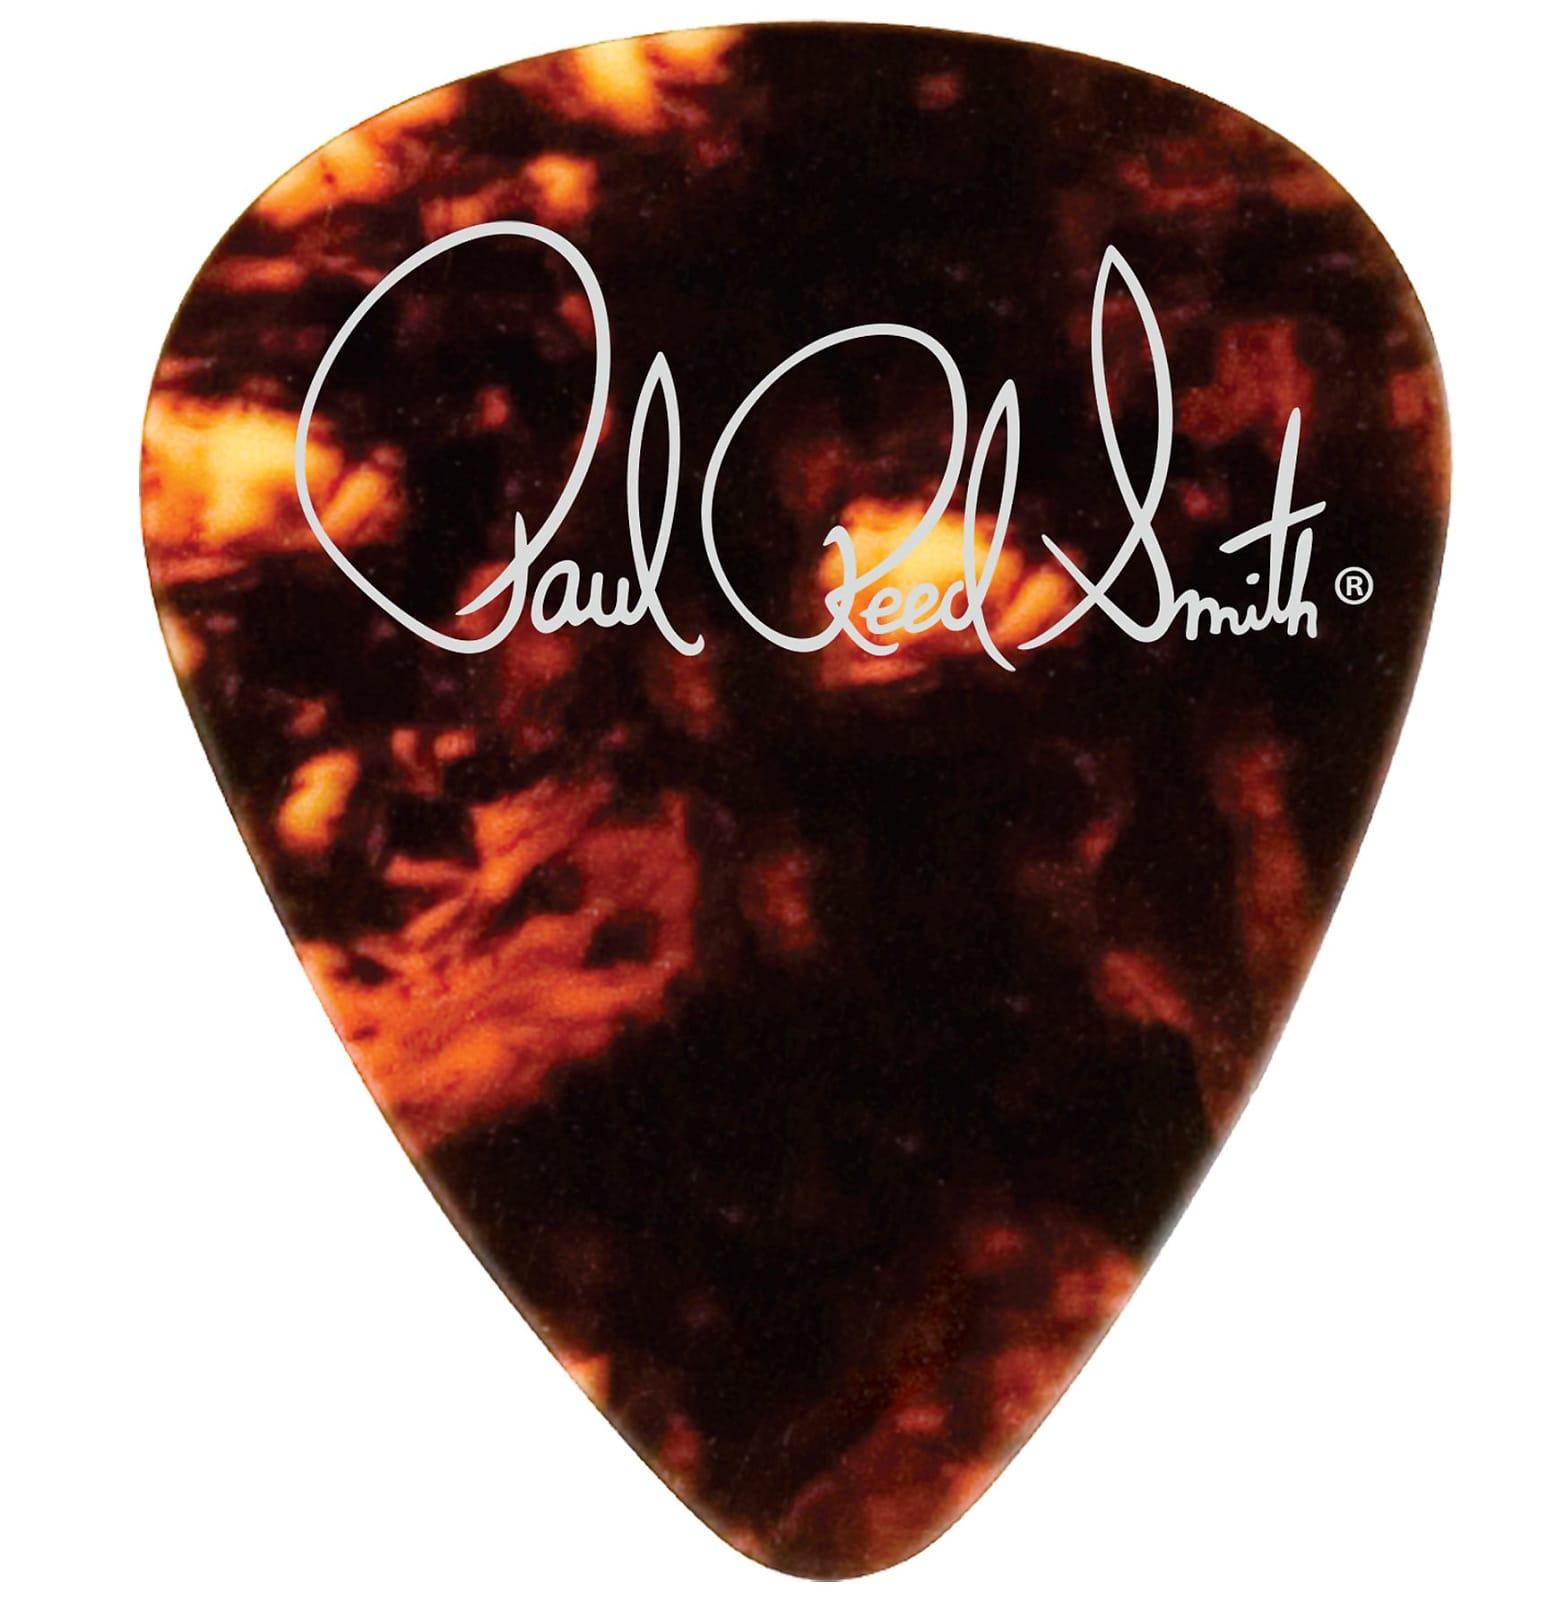 Paul Reed Smith PRS Tortoise Celluloid Guitar Picks (12) – Medium